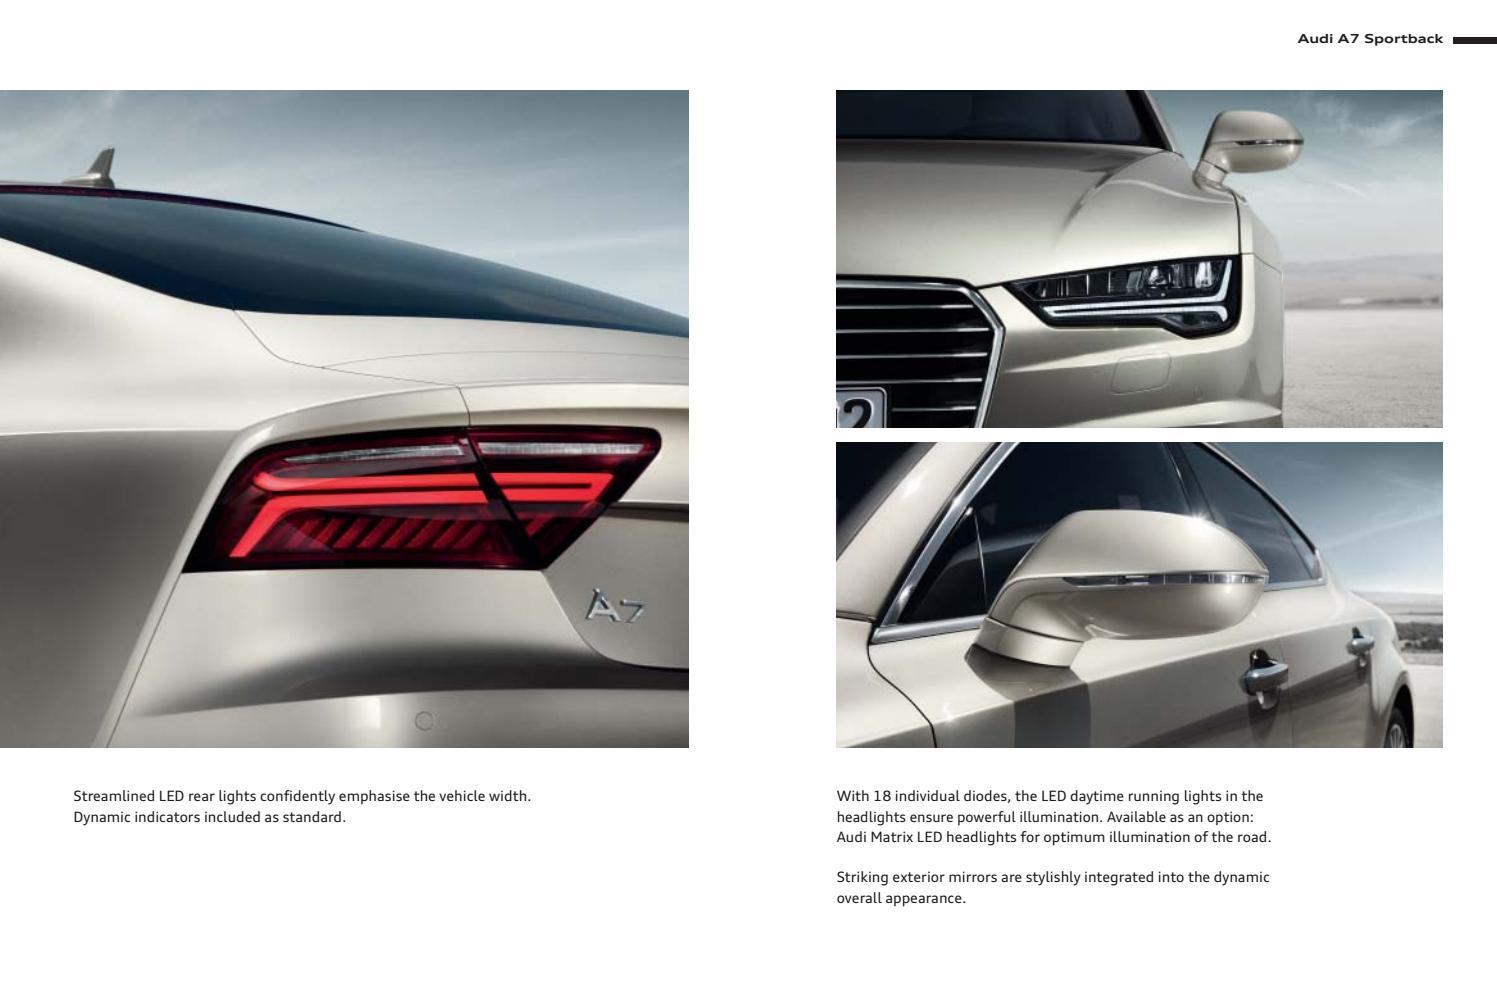 Audi A7 Ja Audi S7 Esite 42016 By Avidly Agency Issuu